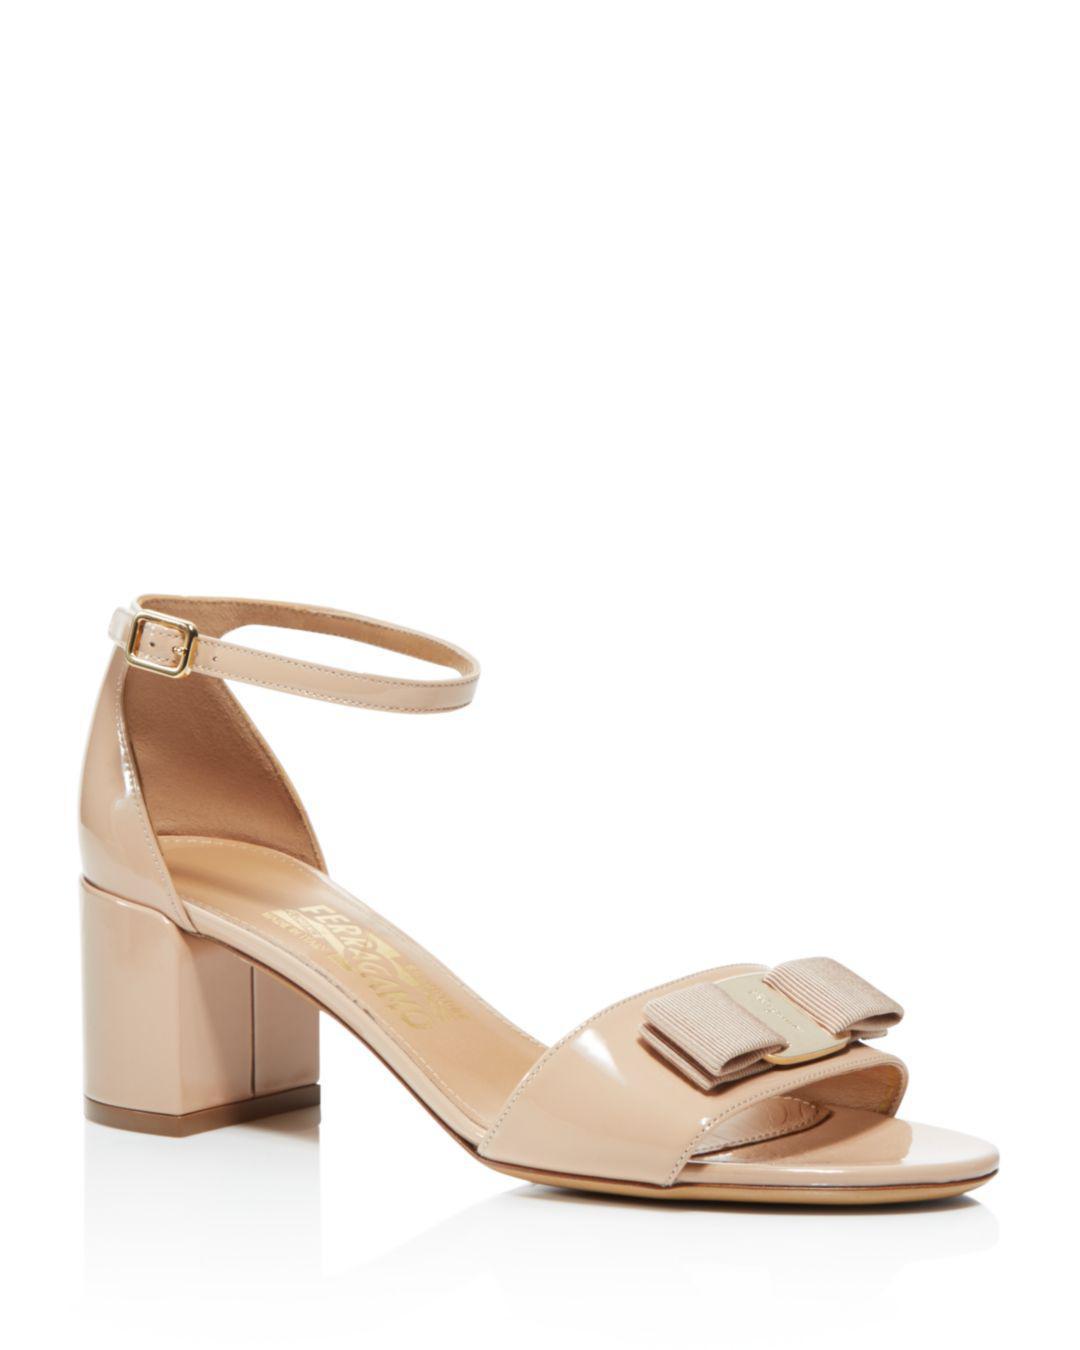 8673f0a1c35 Ferragamo - Natural Women s Gavina Ankle Strap Block Heel Sandals - Lyst.  View fullscreen